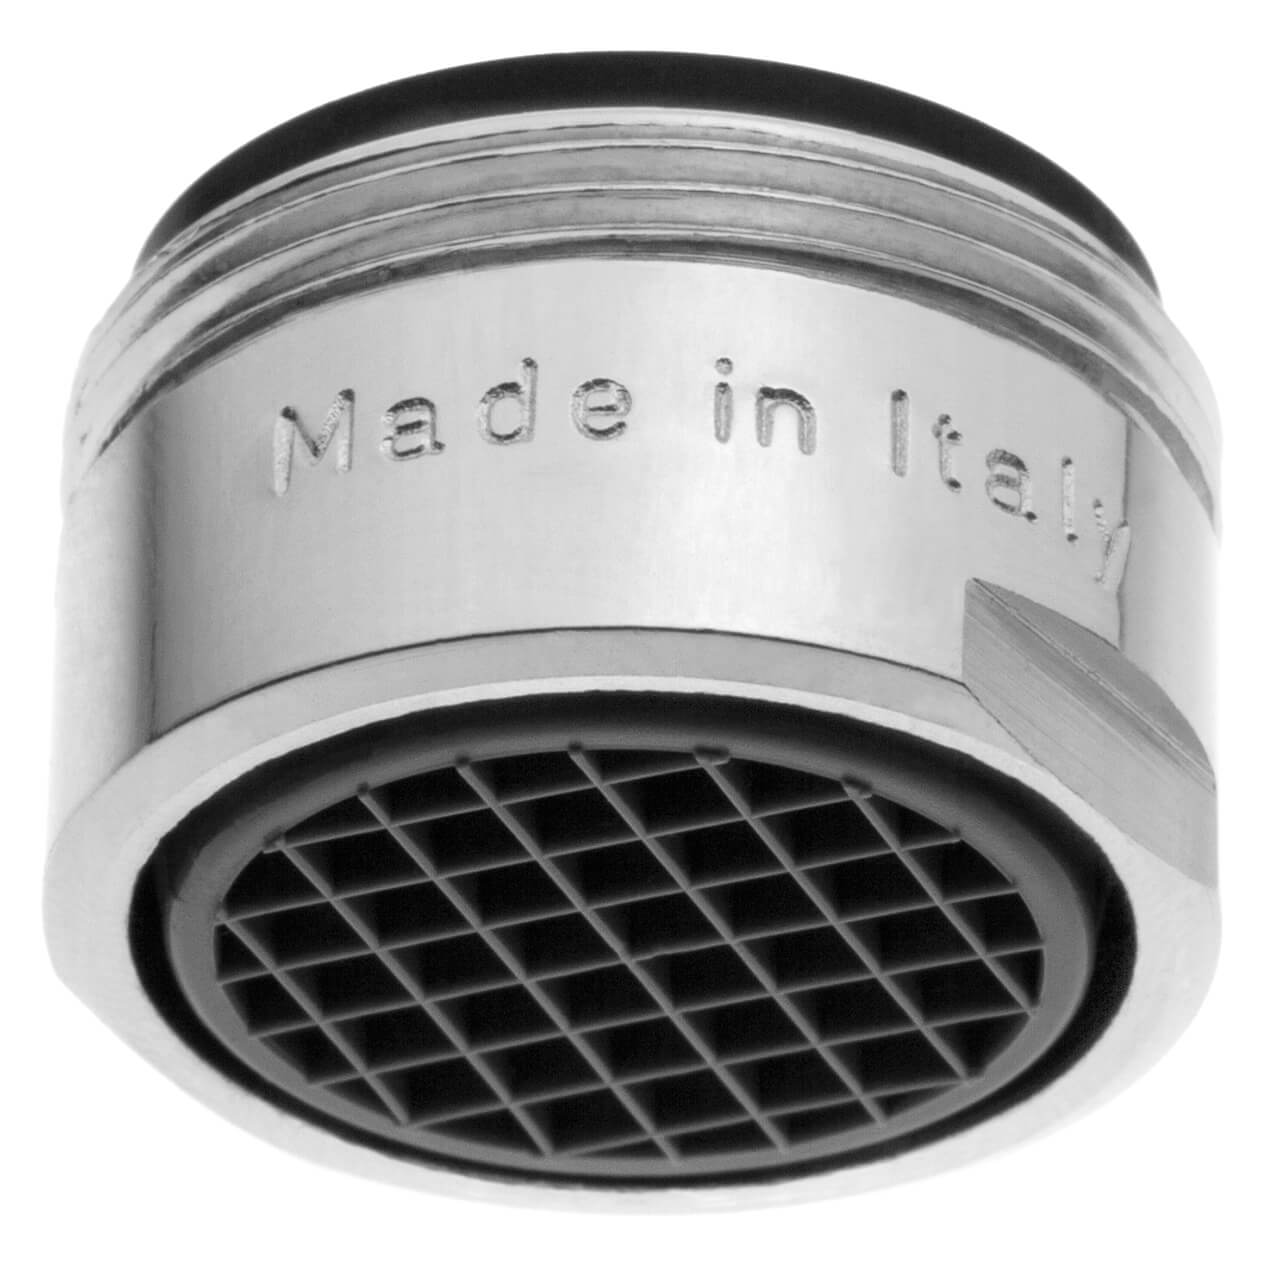 Tap aerator Terla FreeLime 4.5 l/min - Thread M24x1 male - most popular